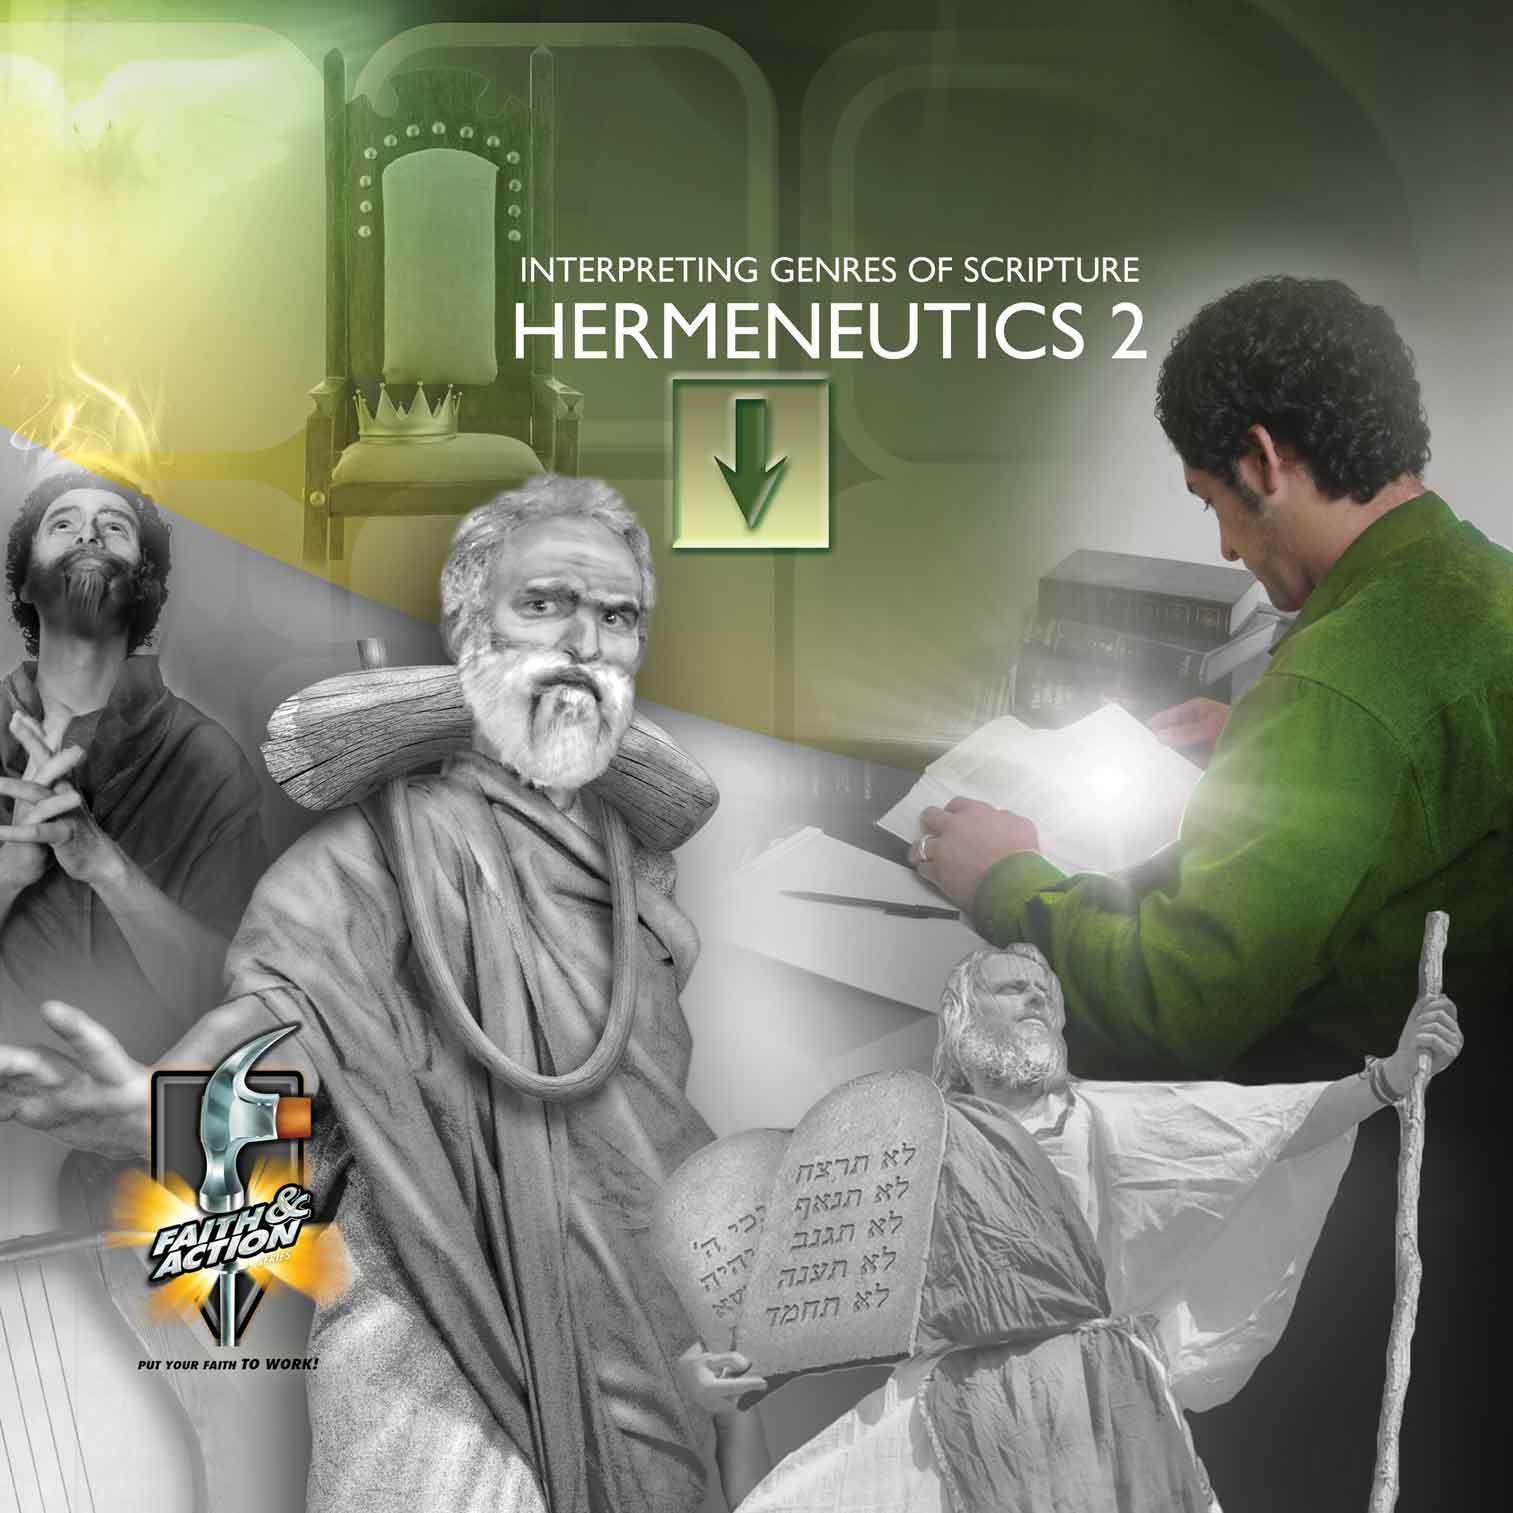 Hermeneutics 2—Interpreting Genres of Scripture - eVisuals Zipped Download - 4421-23EX